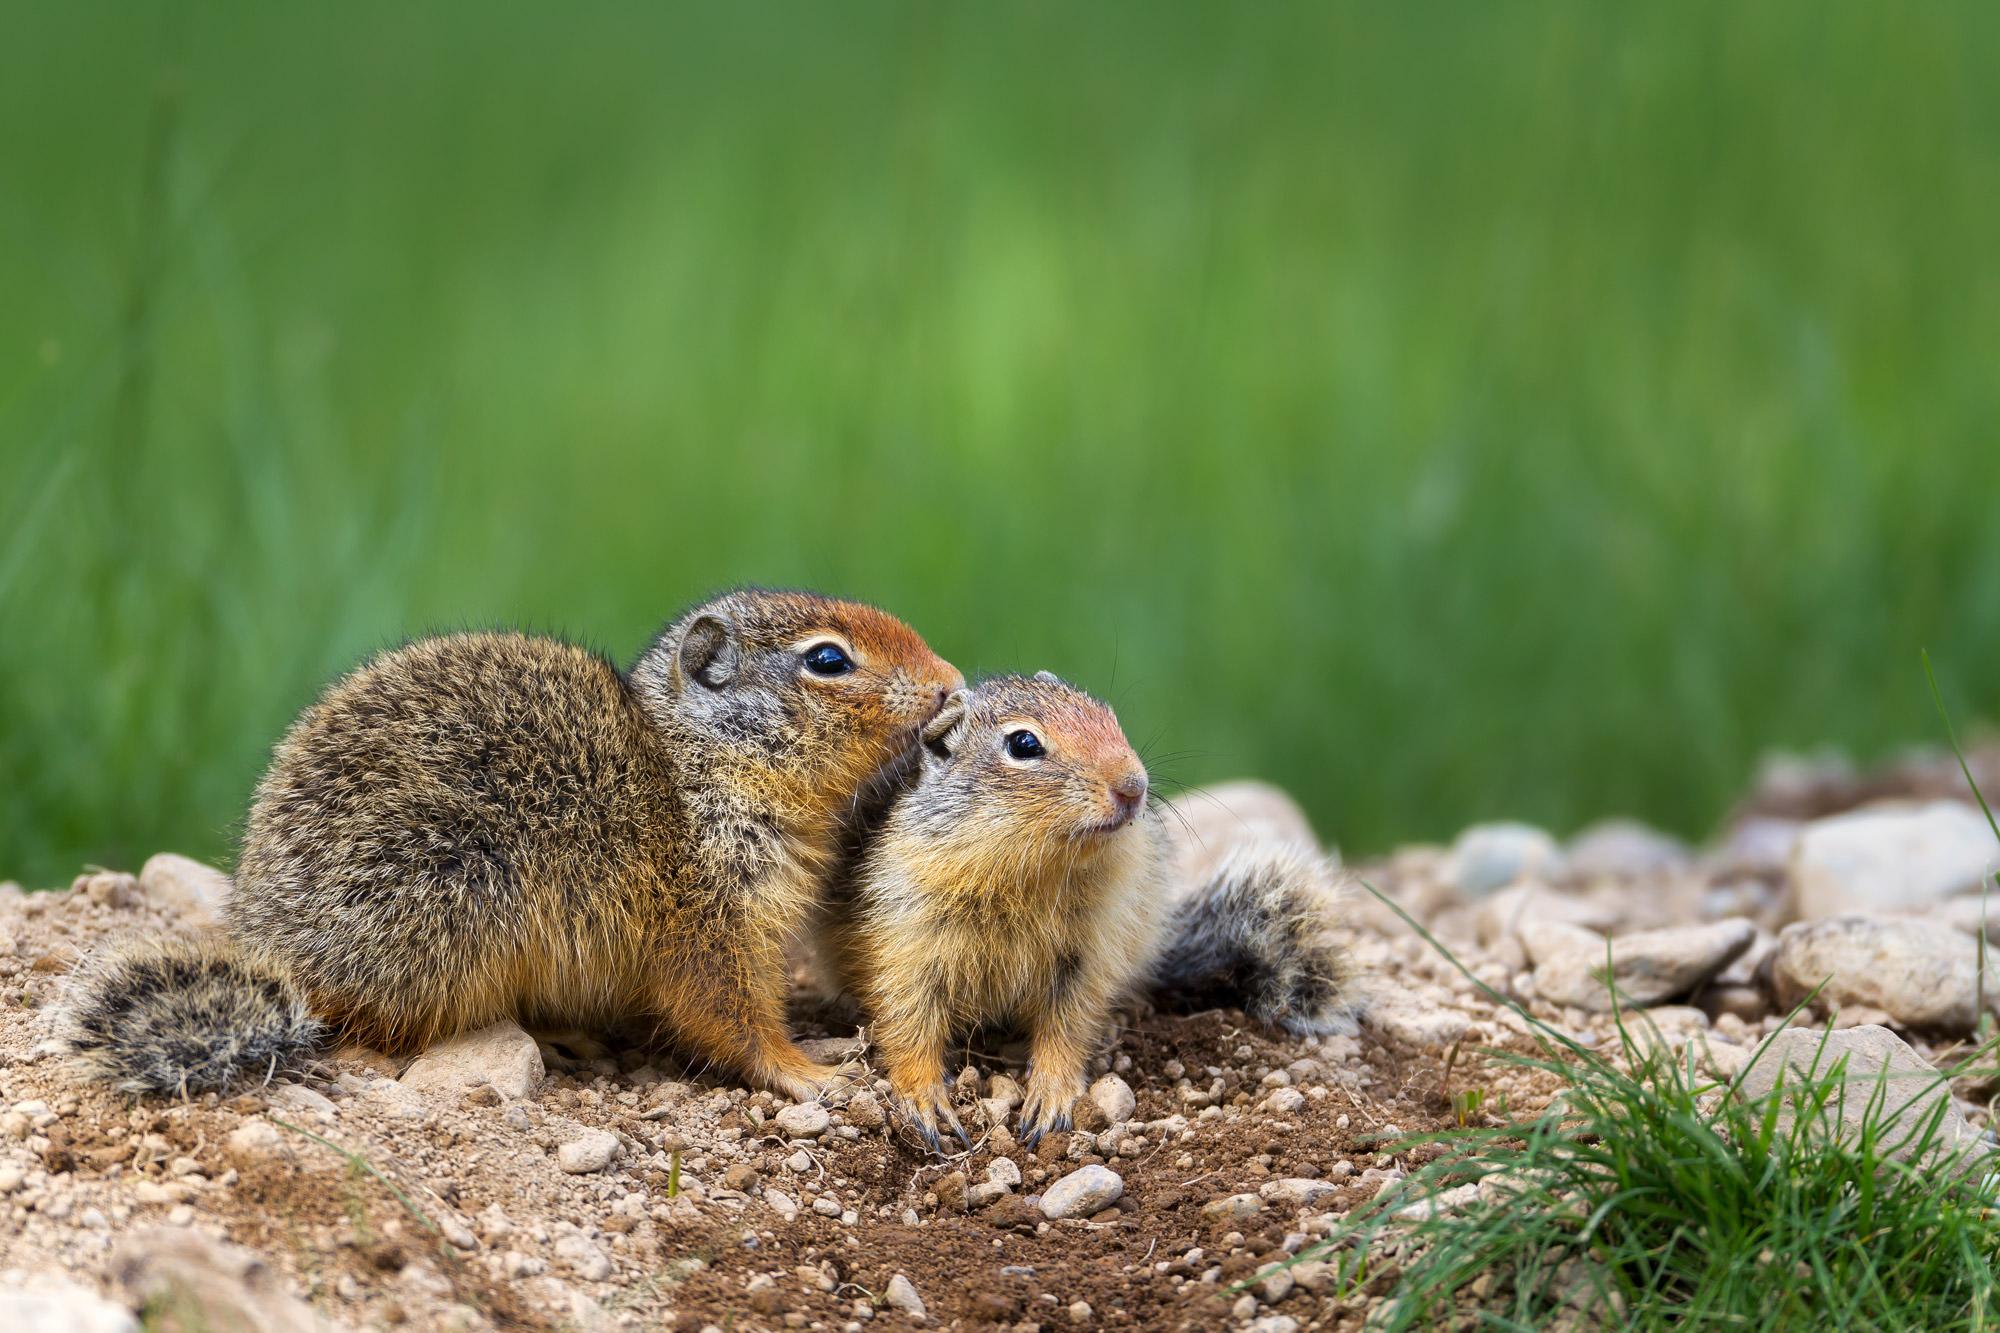 Ground Squirrel, Glacier, National Park, Montana, limited edition, photograph, fine art, wildlife, photo